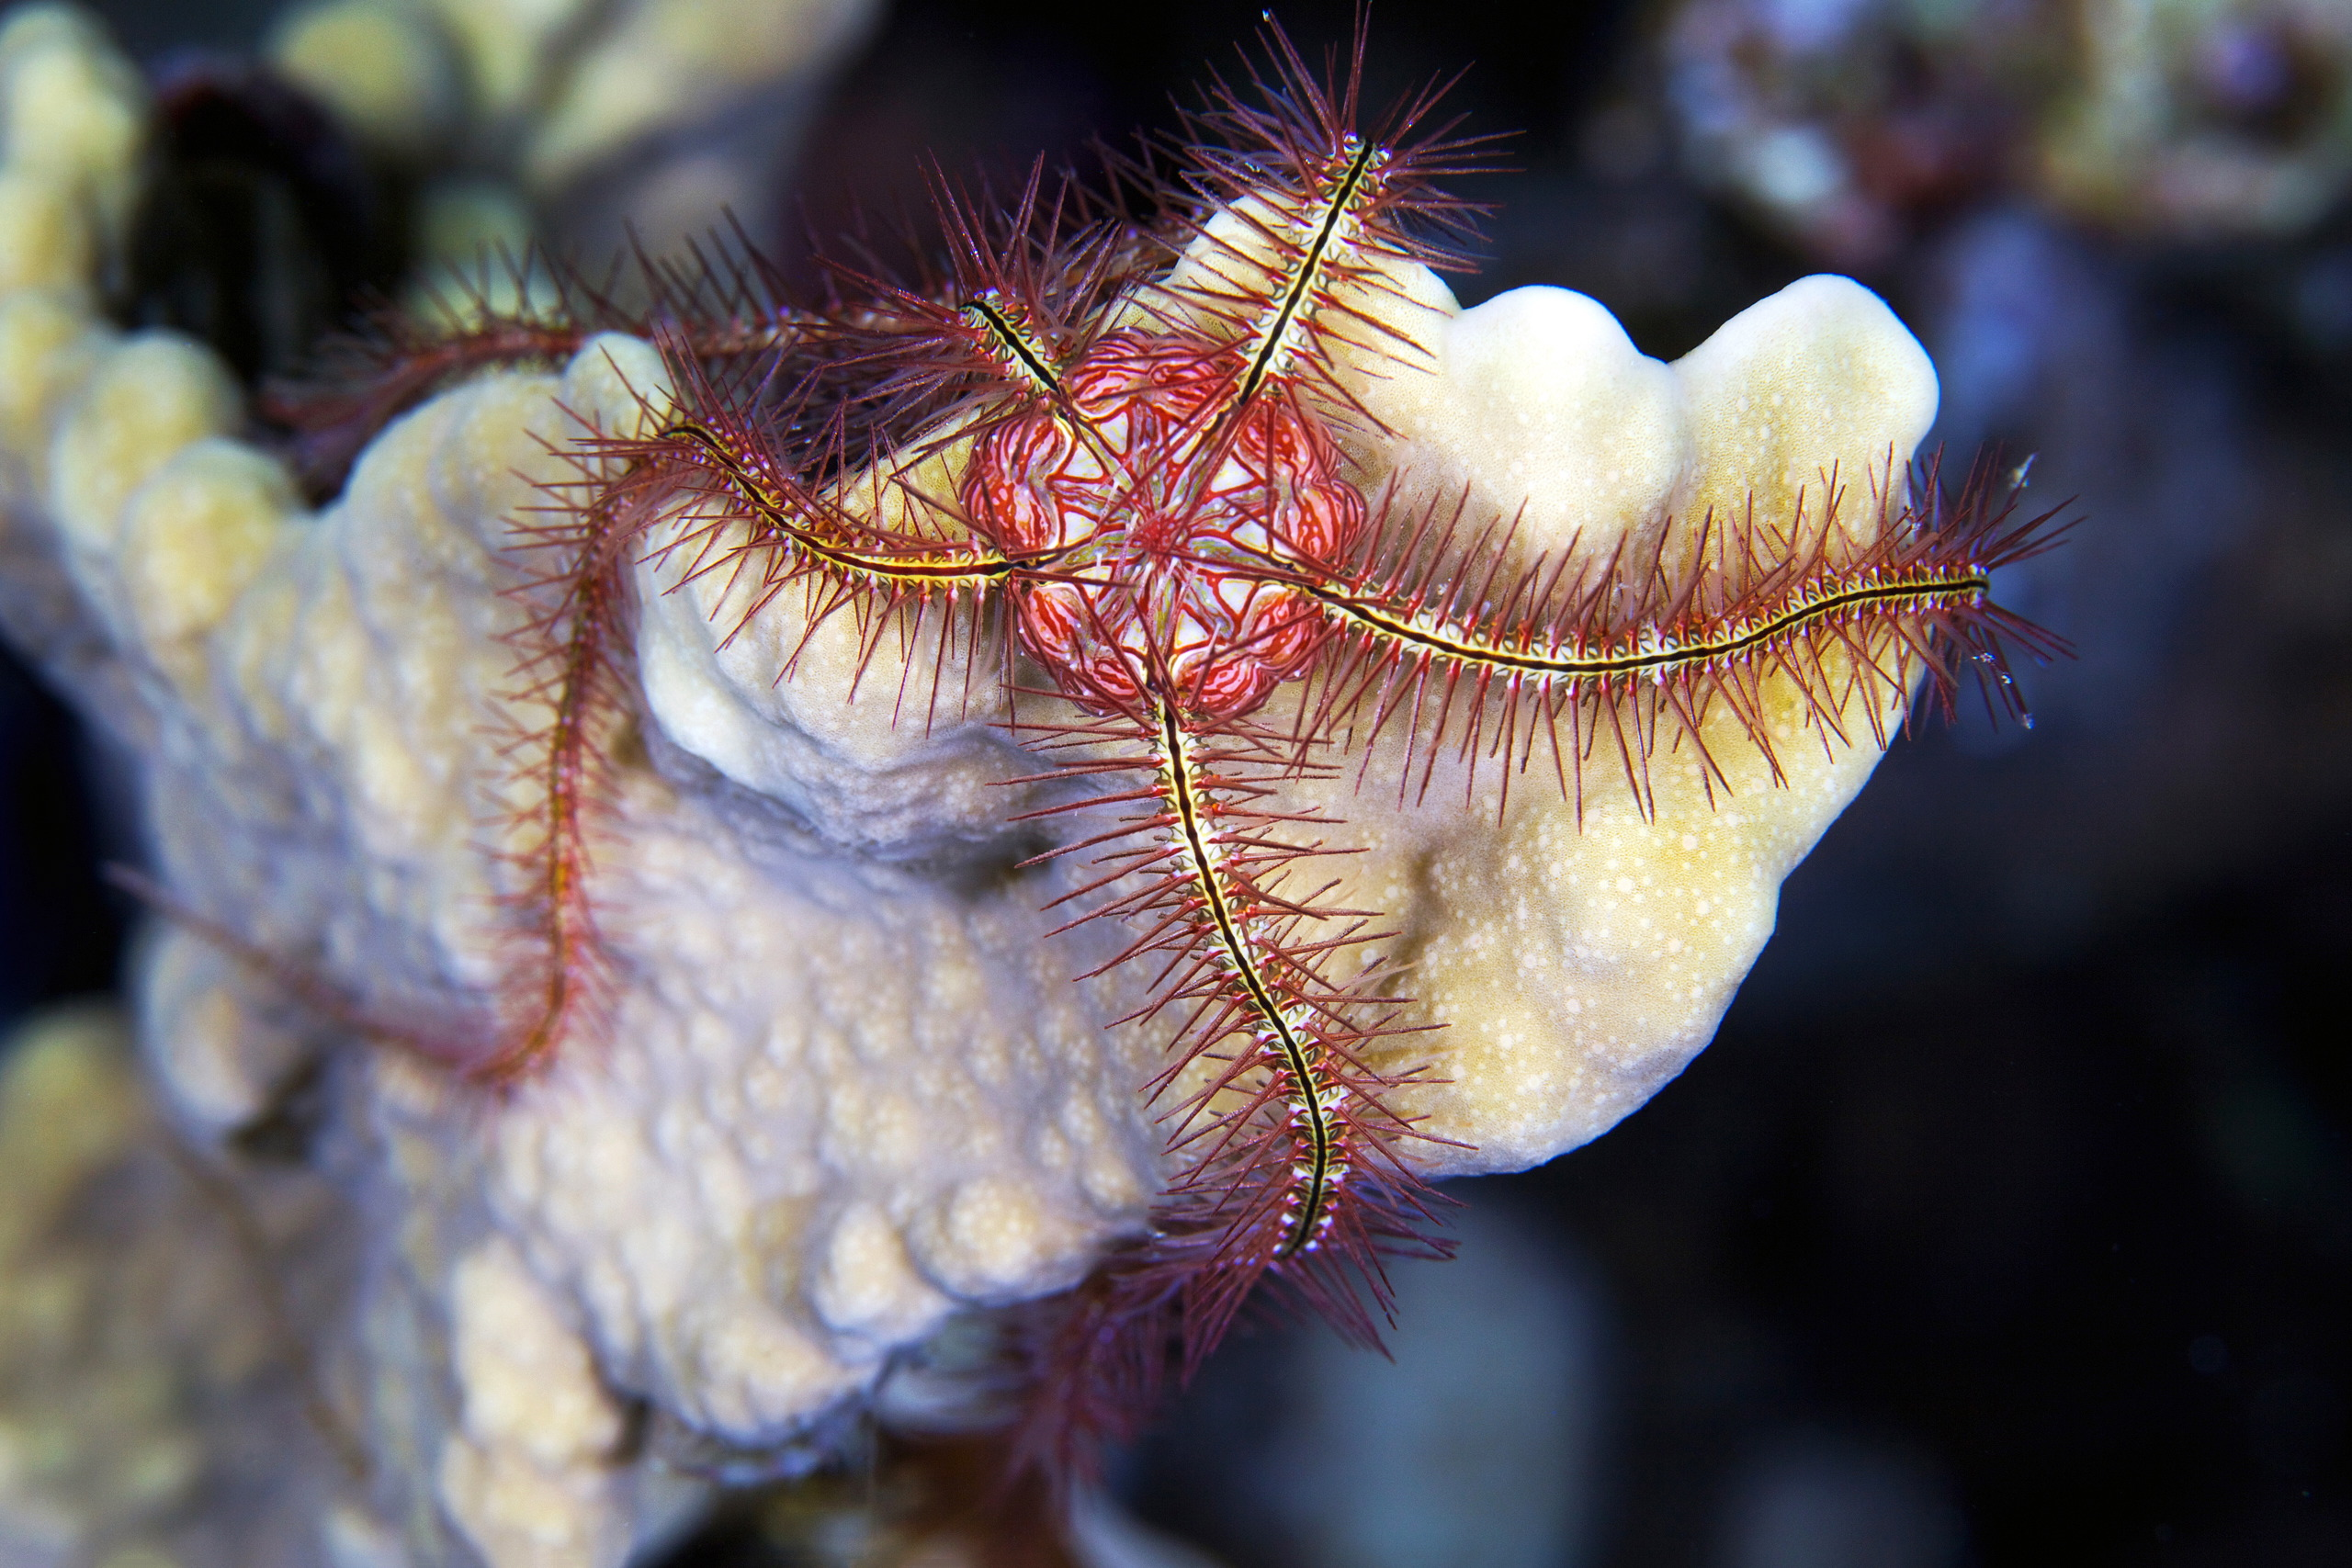 Echinodermata – Ophiothrix savignyi